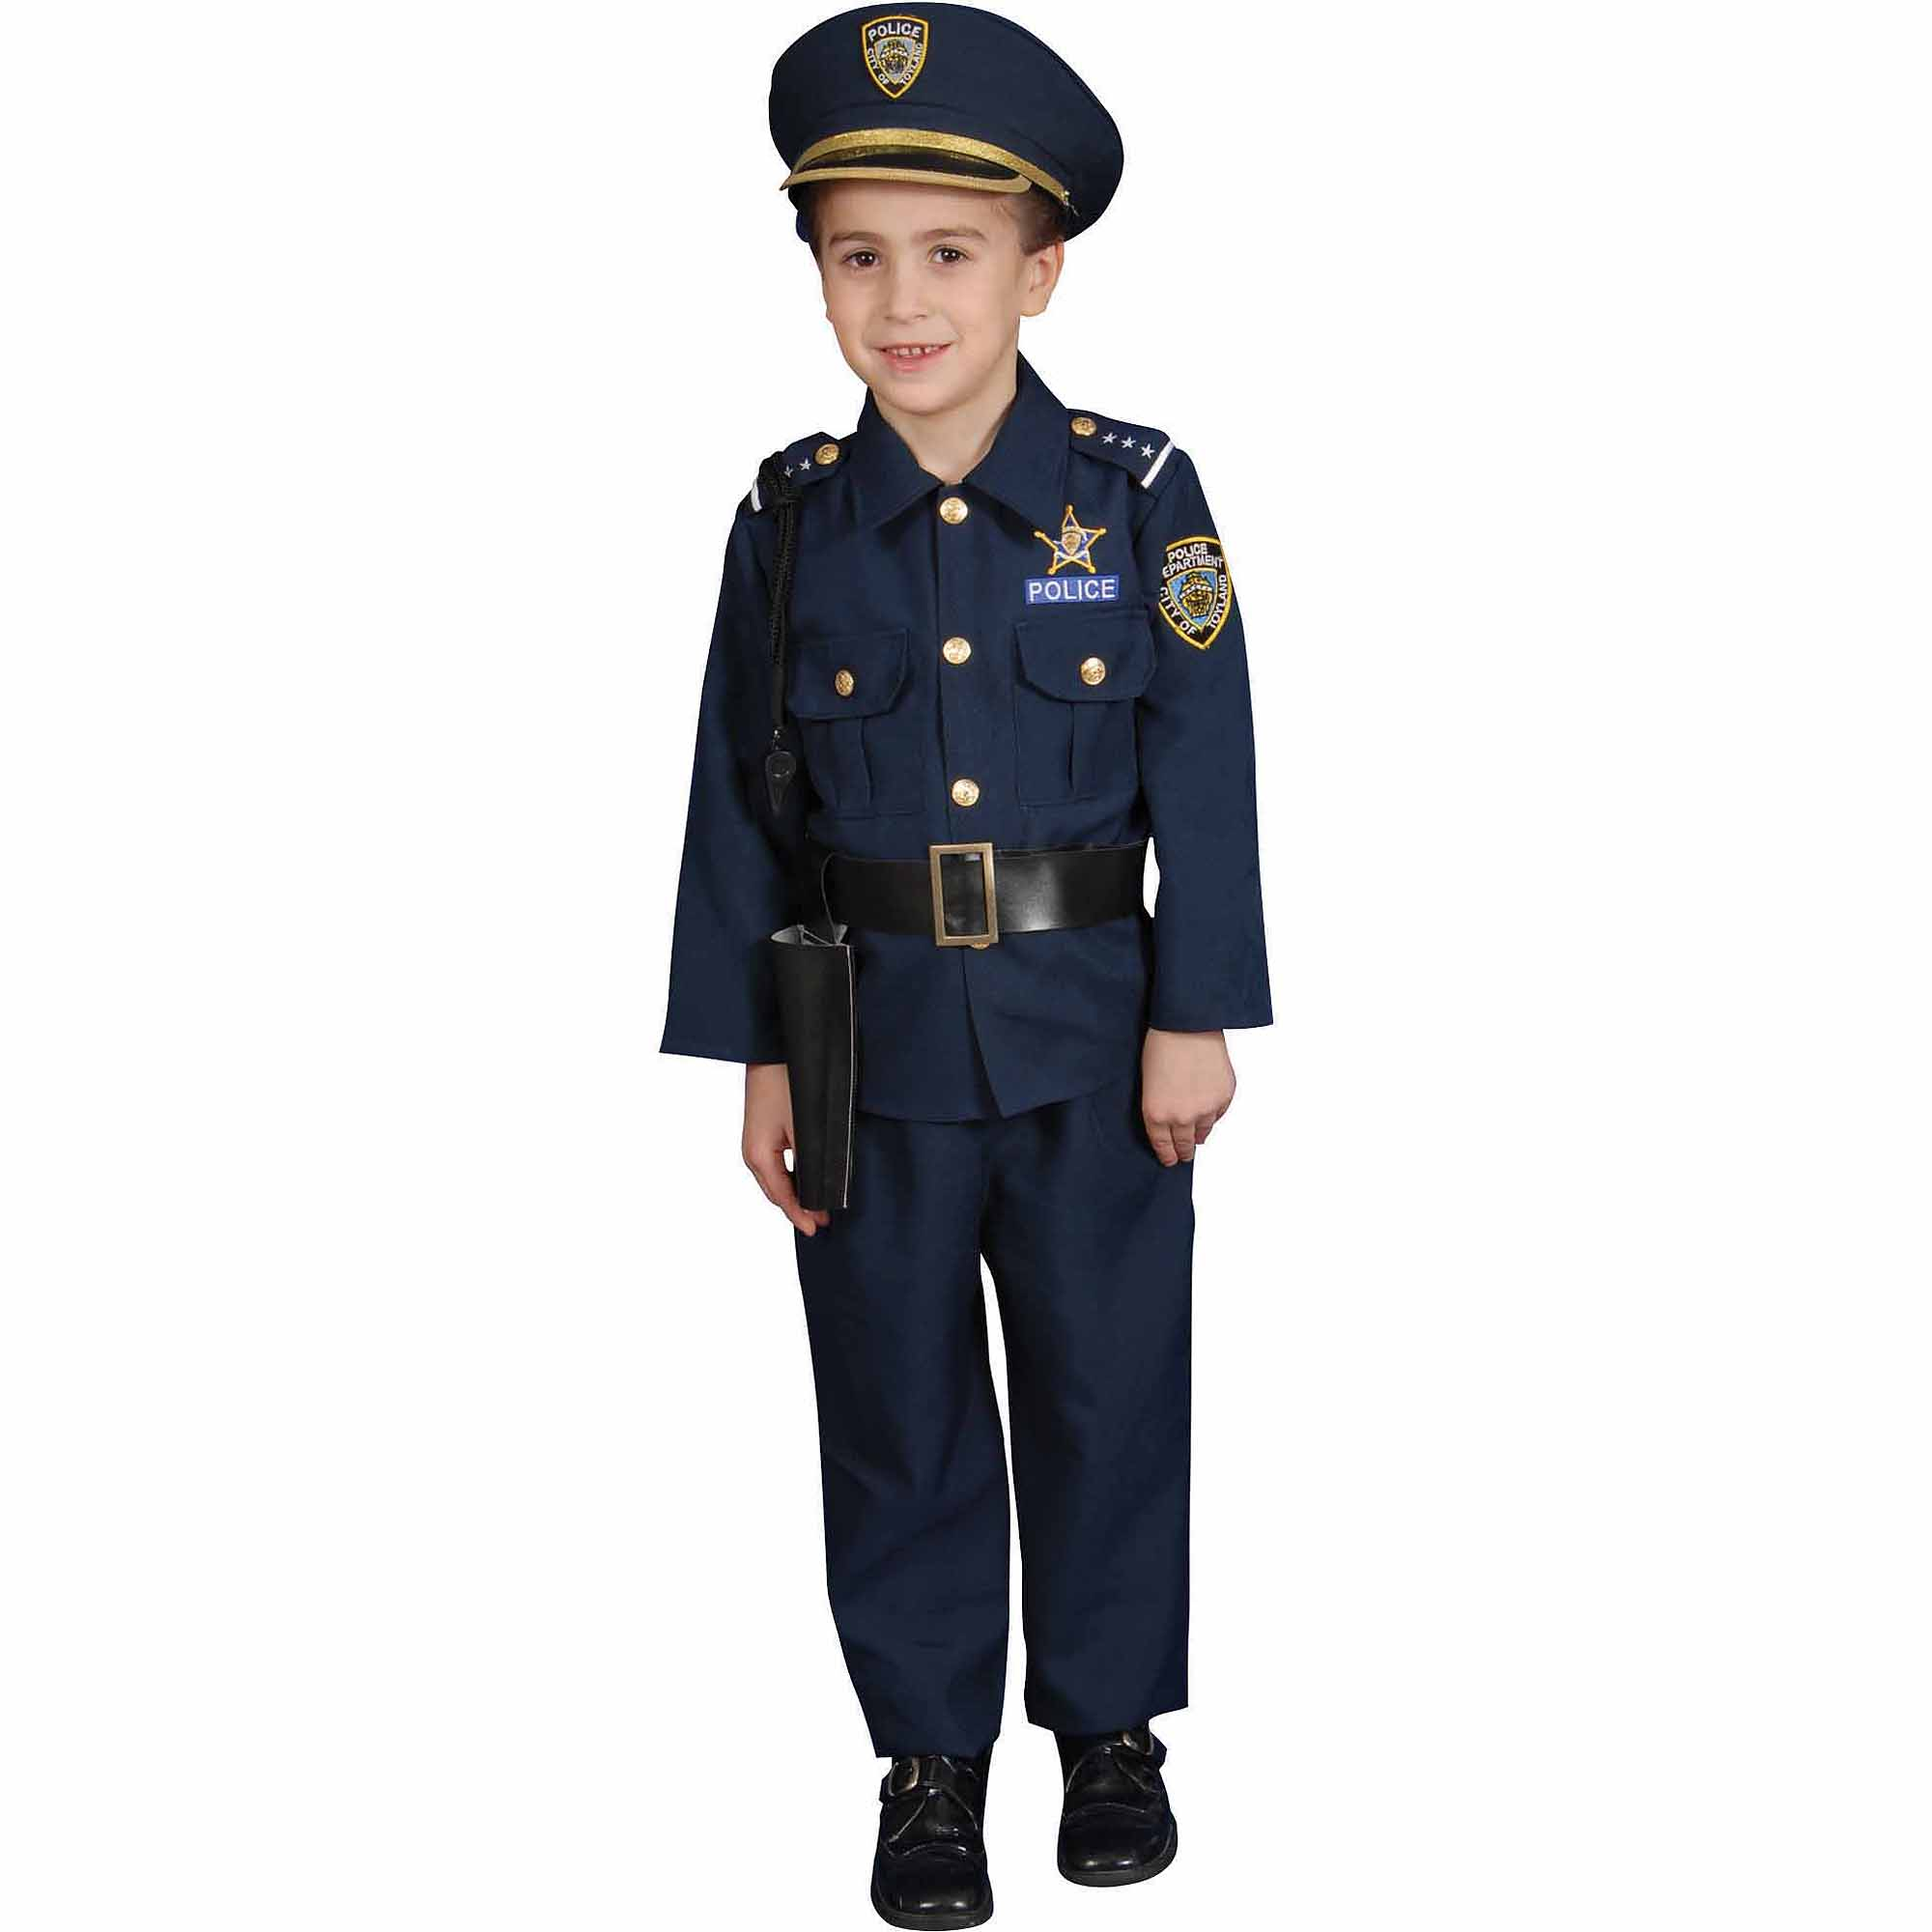 Police Child Halloween Costume